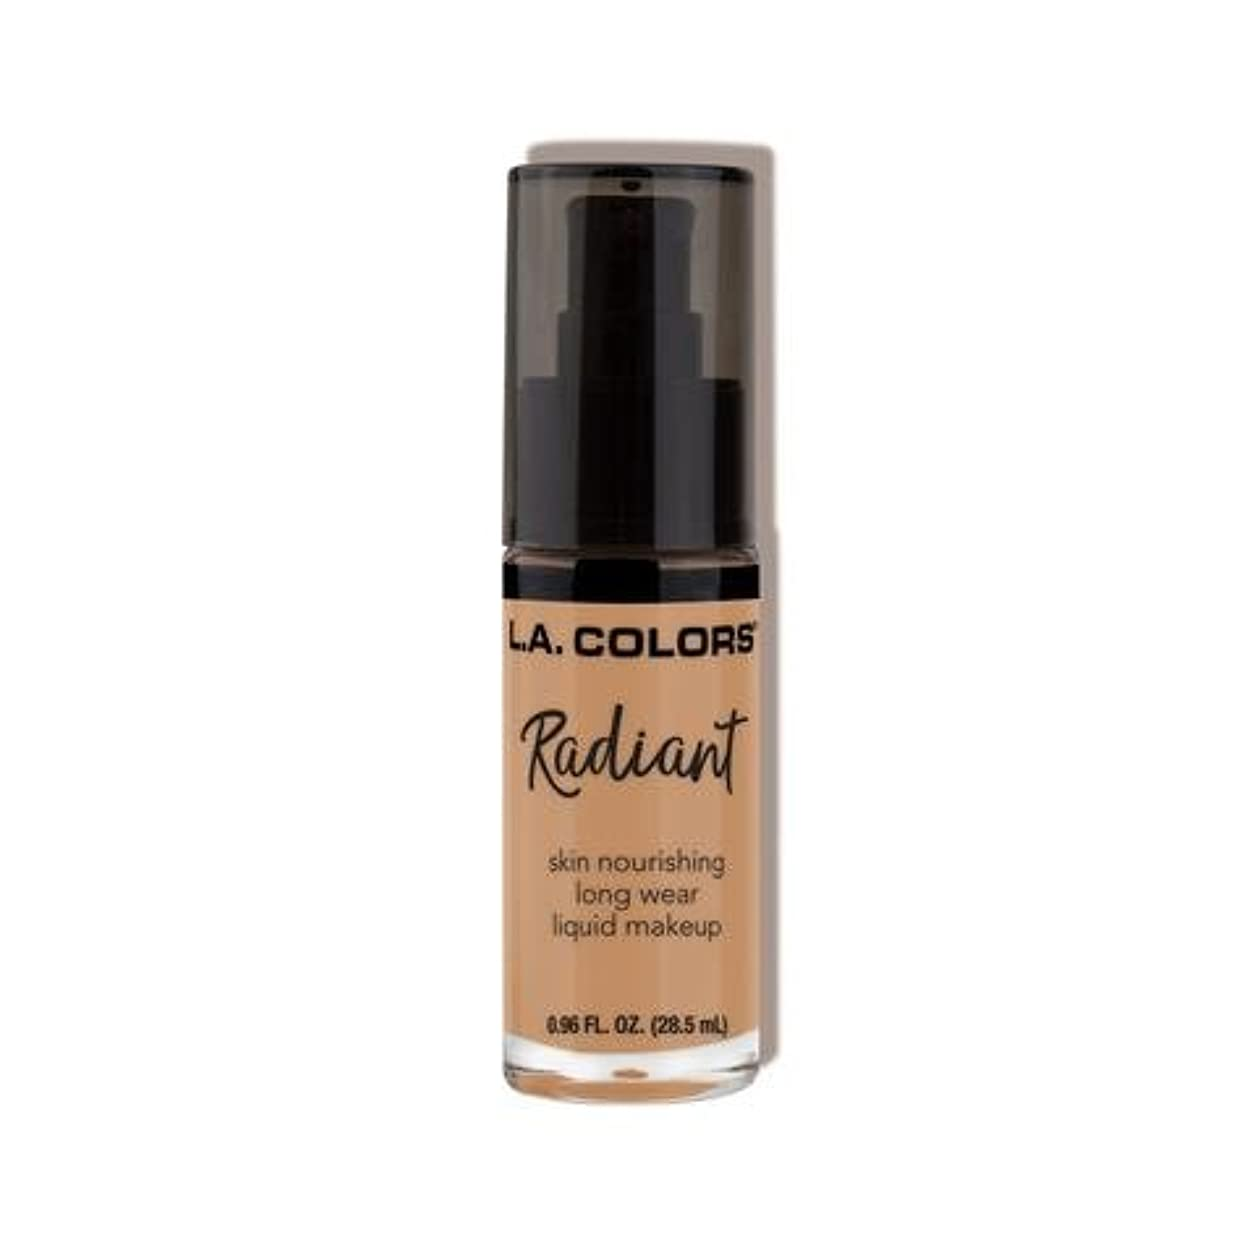 (3 Pack) L.A. COLORS Radiant Liquid Makeup - Suede (並行輸入品)